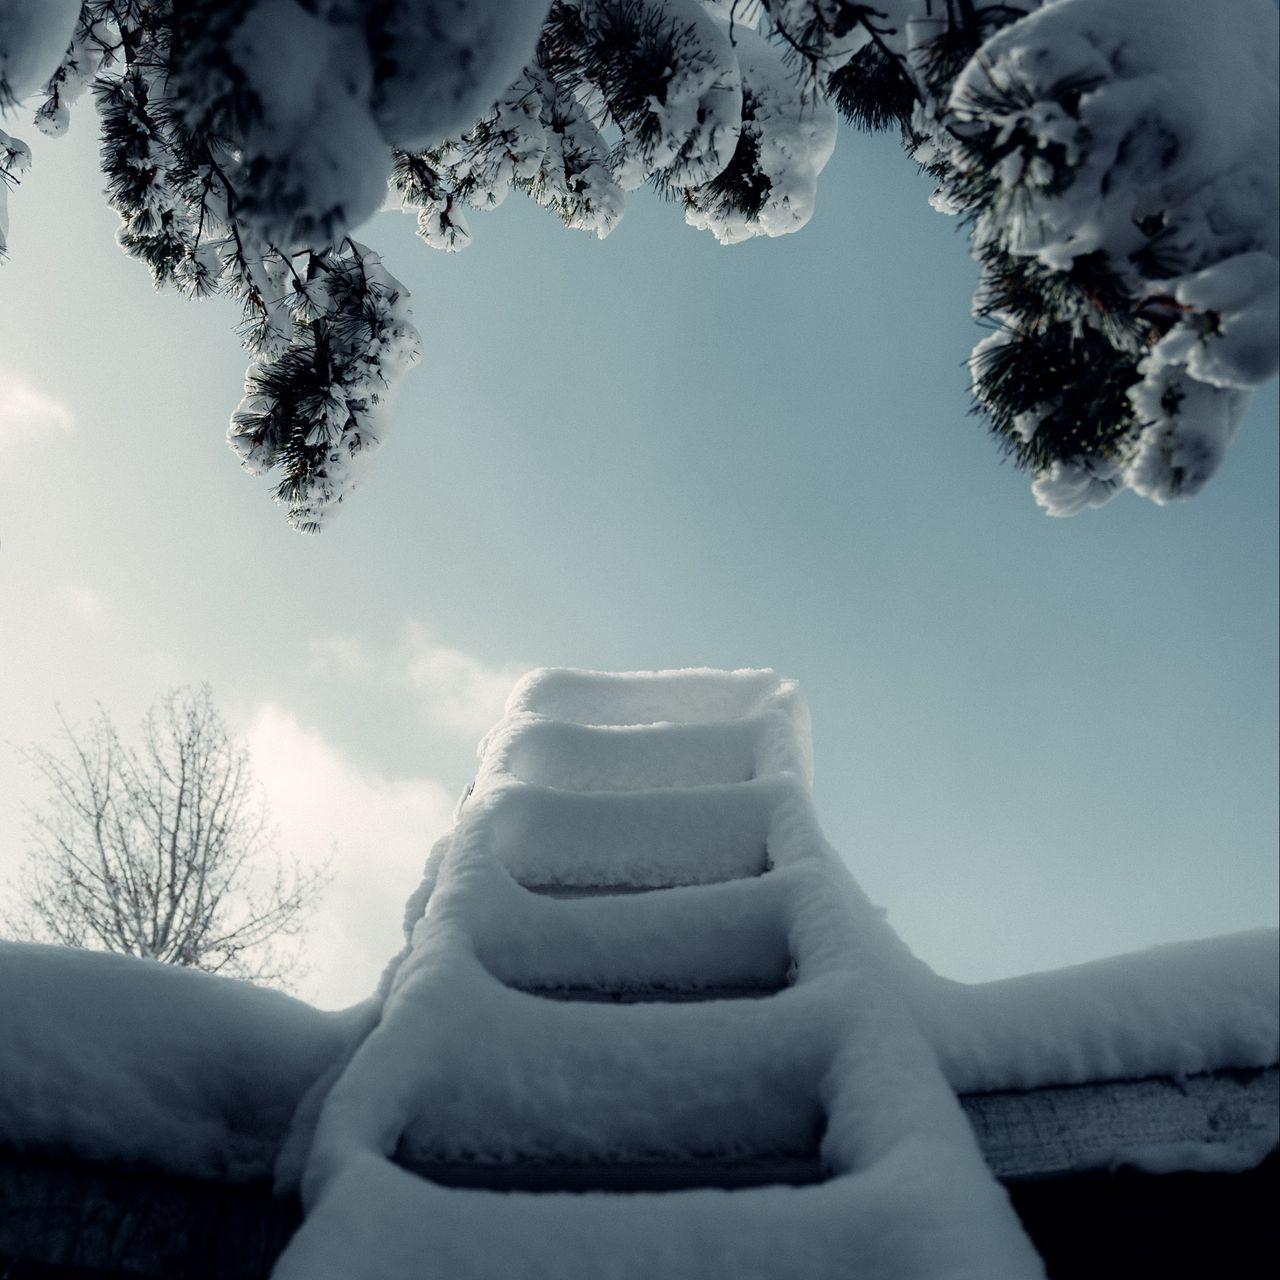 1280x1280 Wallpaper ladder, snow, branch, winter